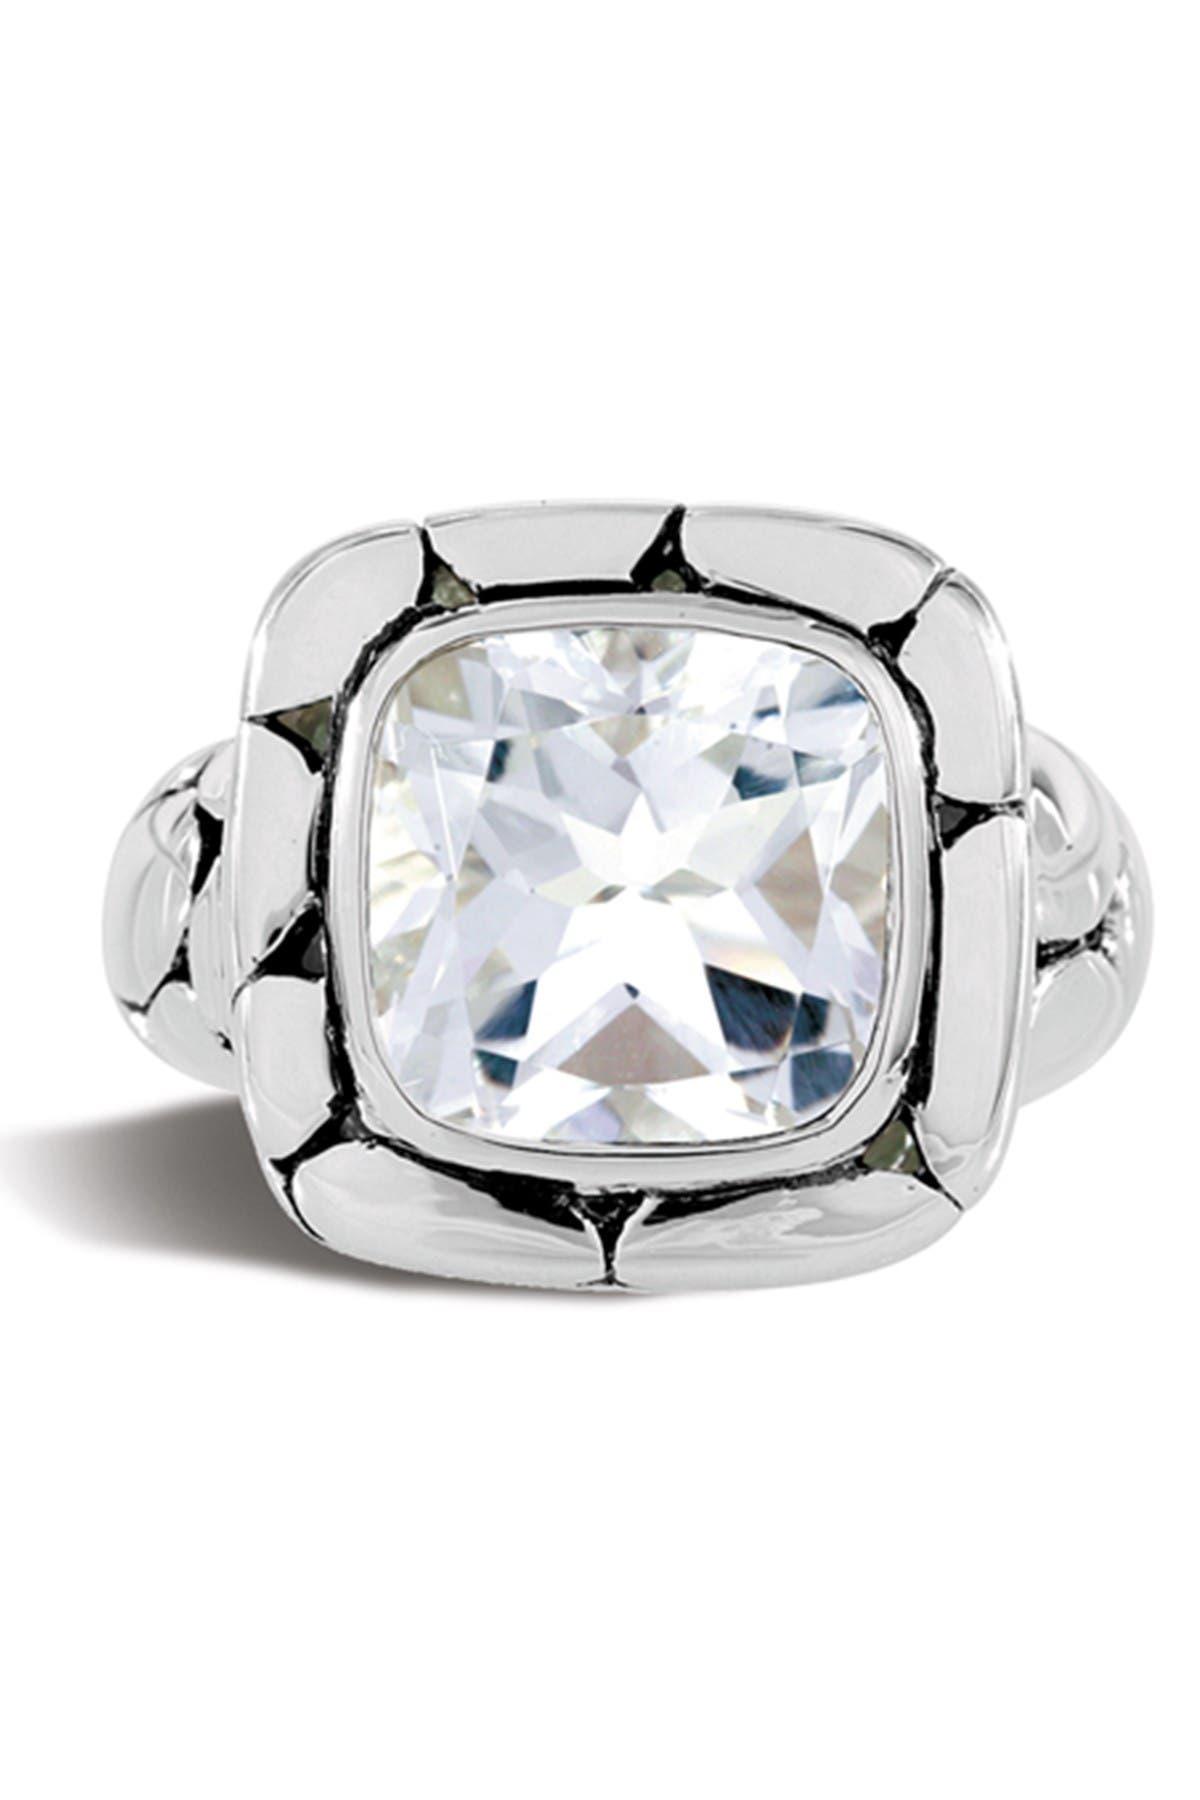 Image of JOHN HARDY Sterling Silver Batu Kali White Topaz Ring - Size 7